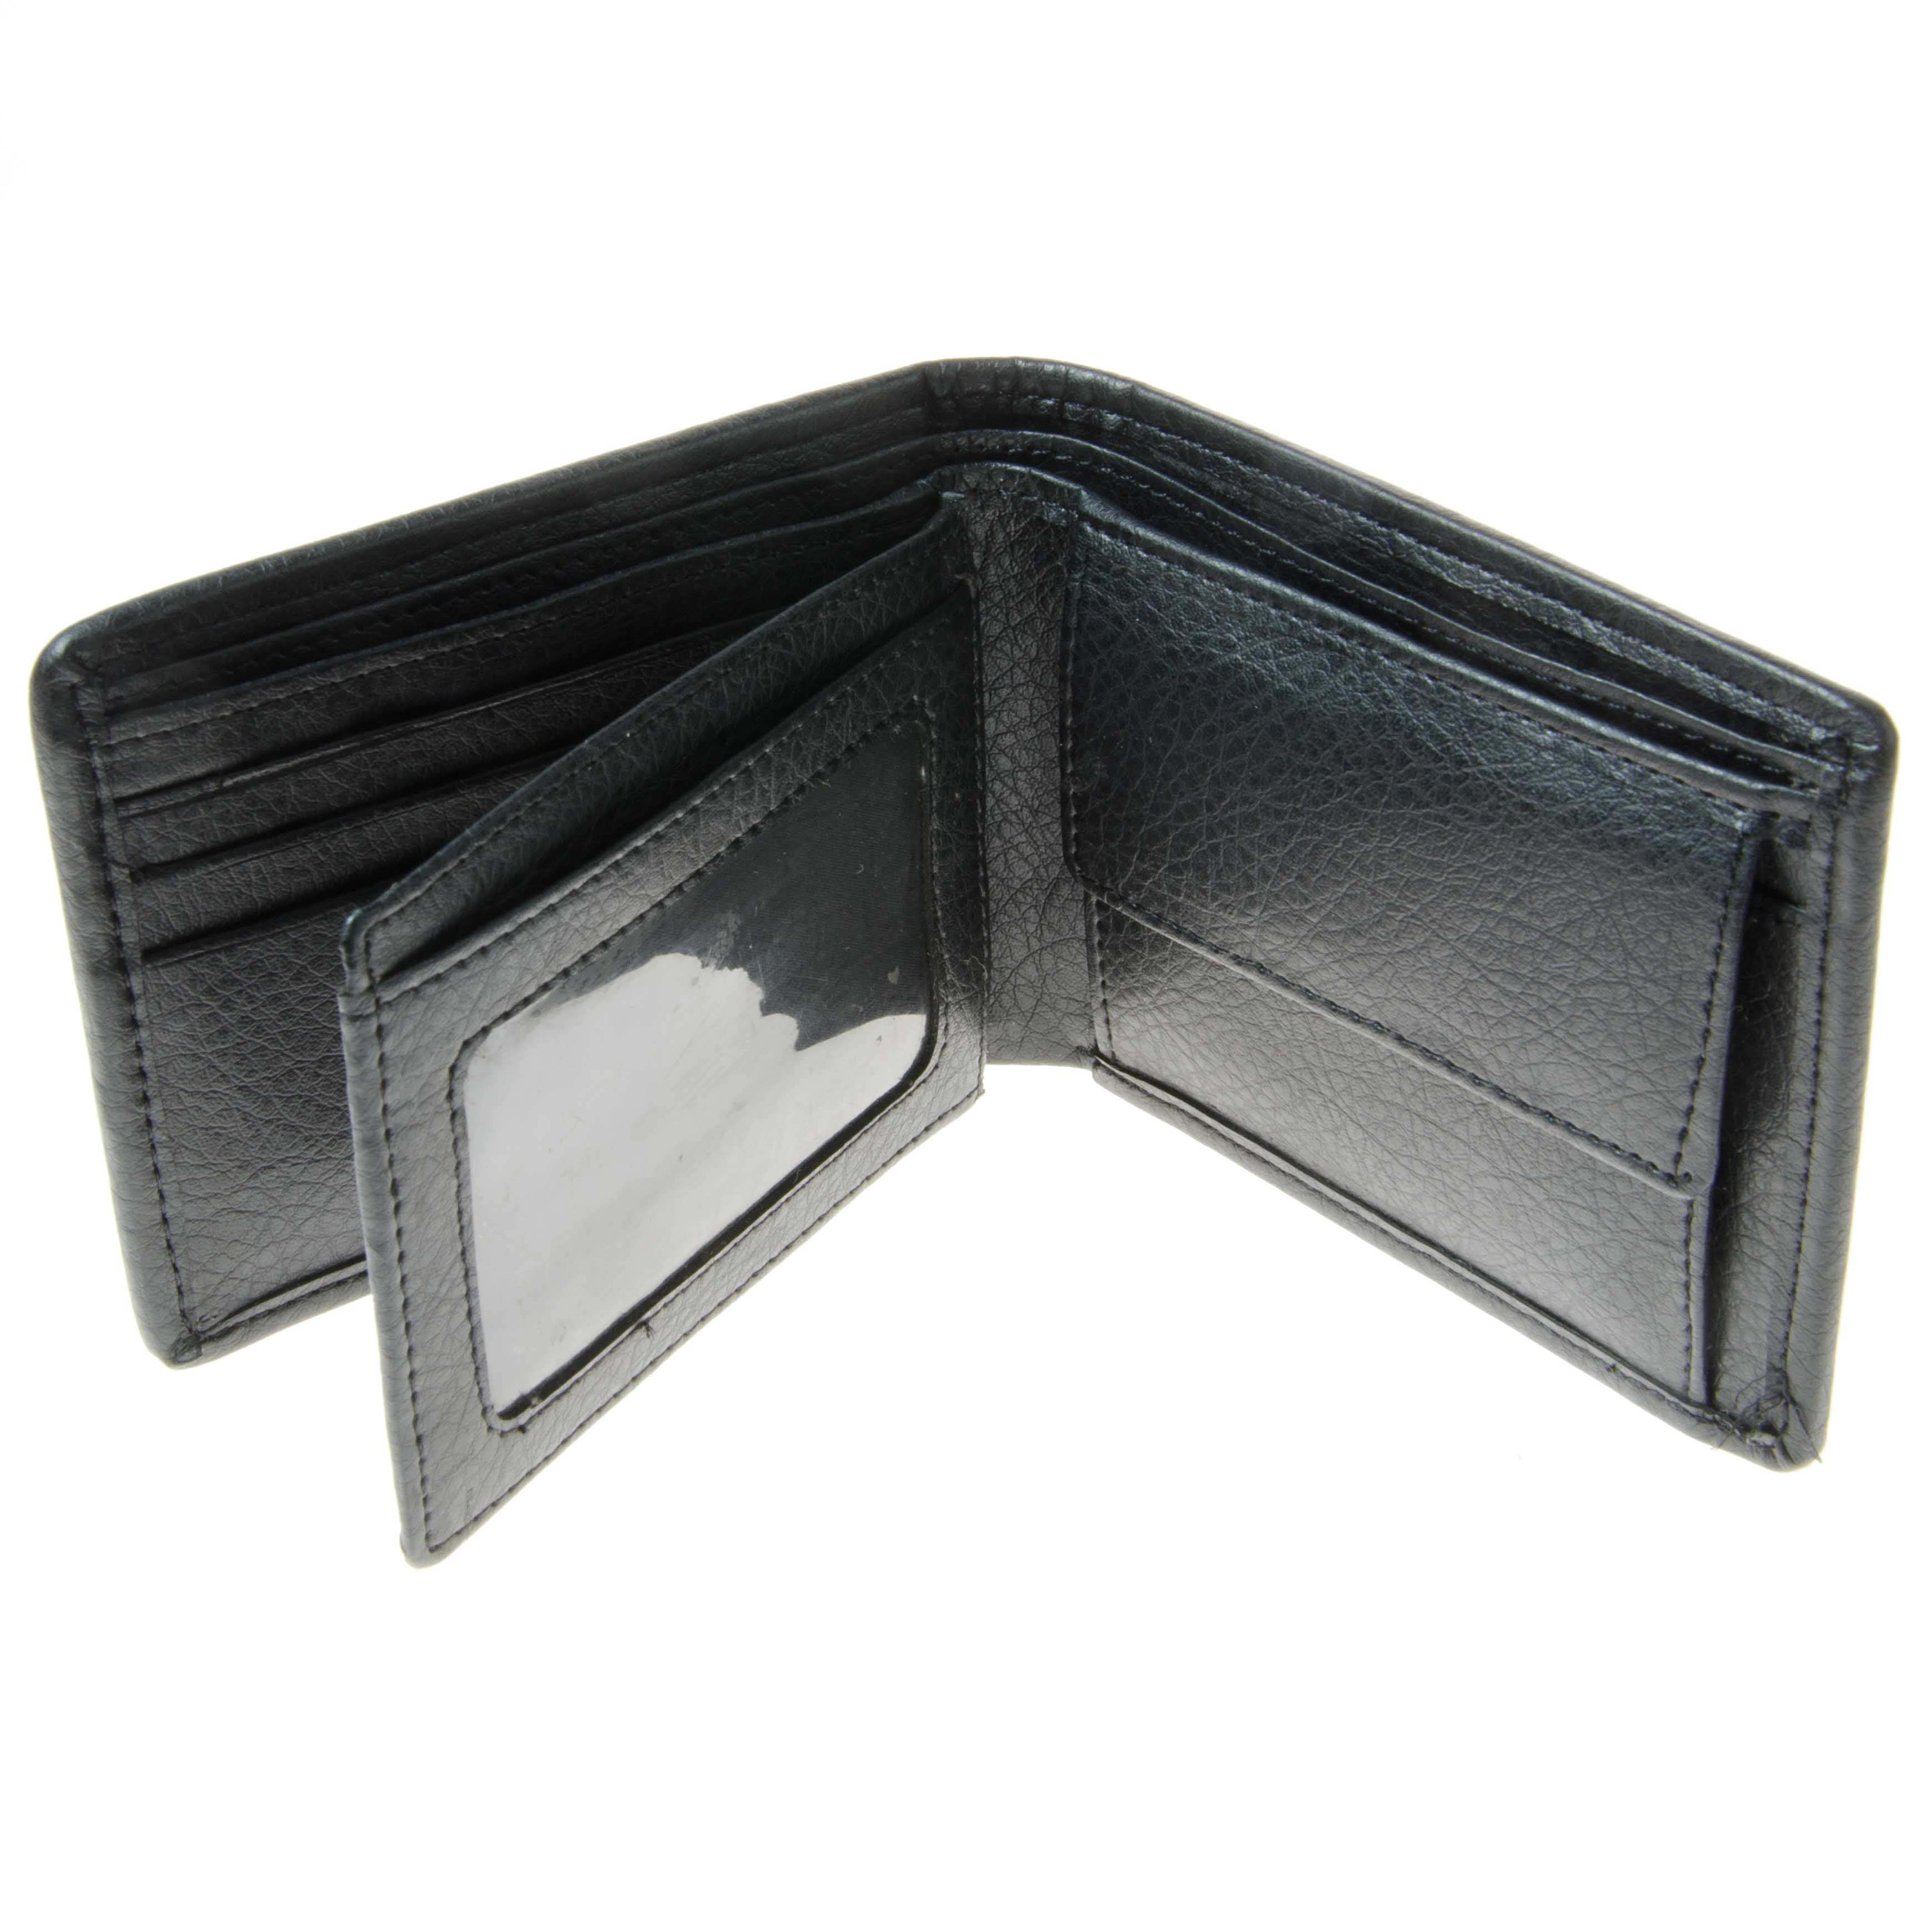 Cloudberry Harris Tweed Trifold Wallet Blue